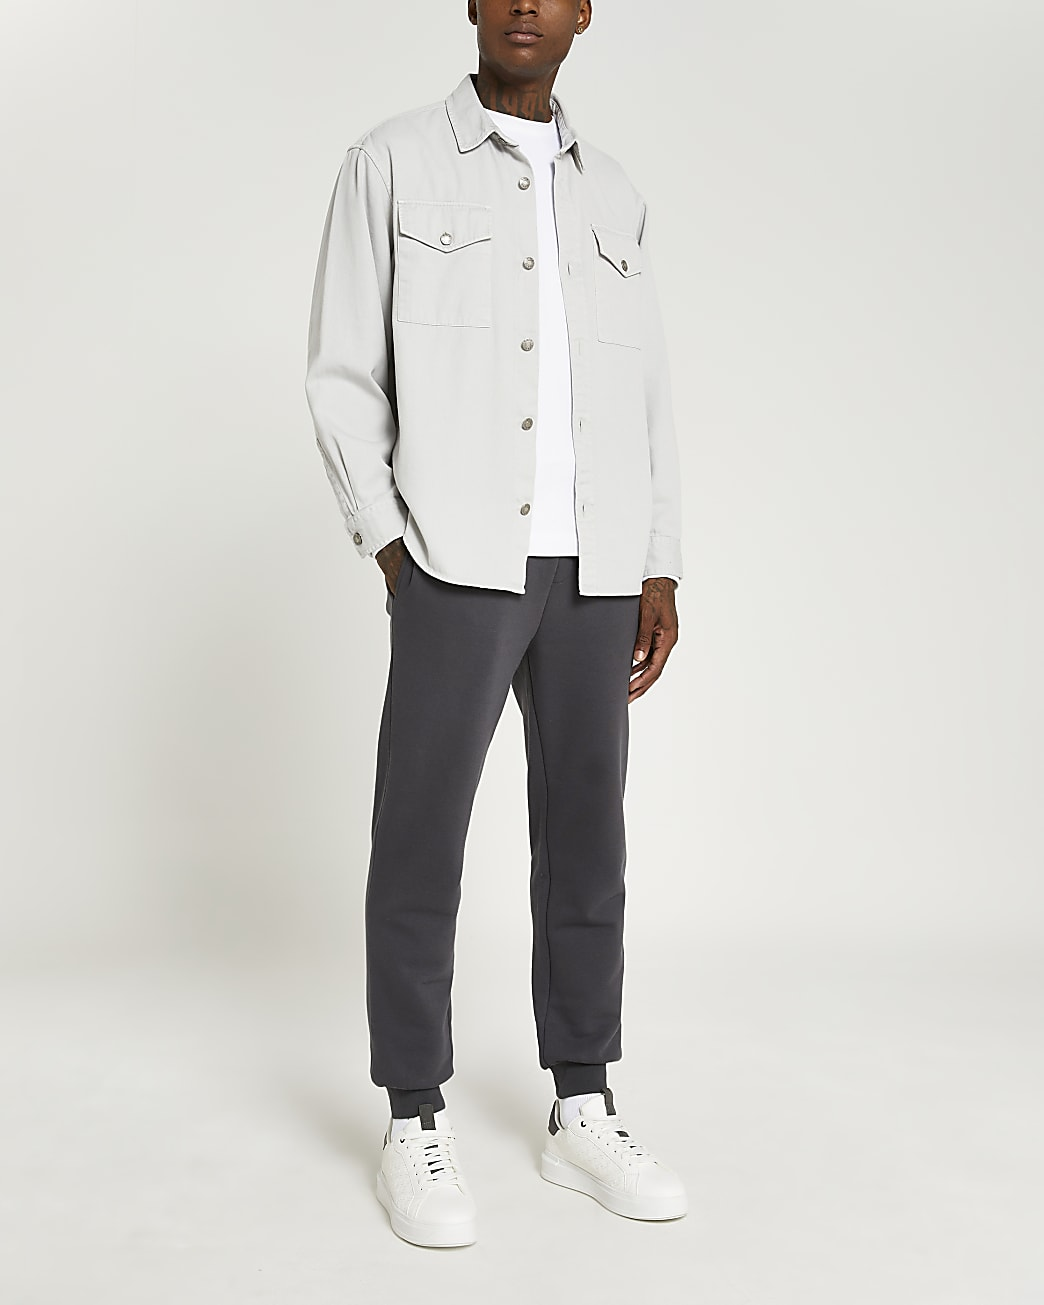 Grey oversized fit twill shirt